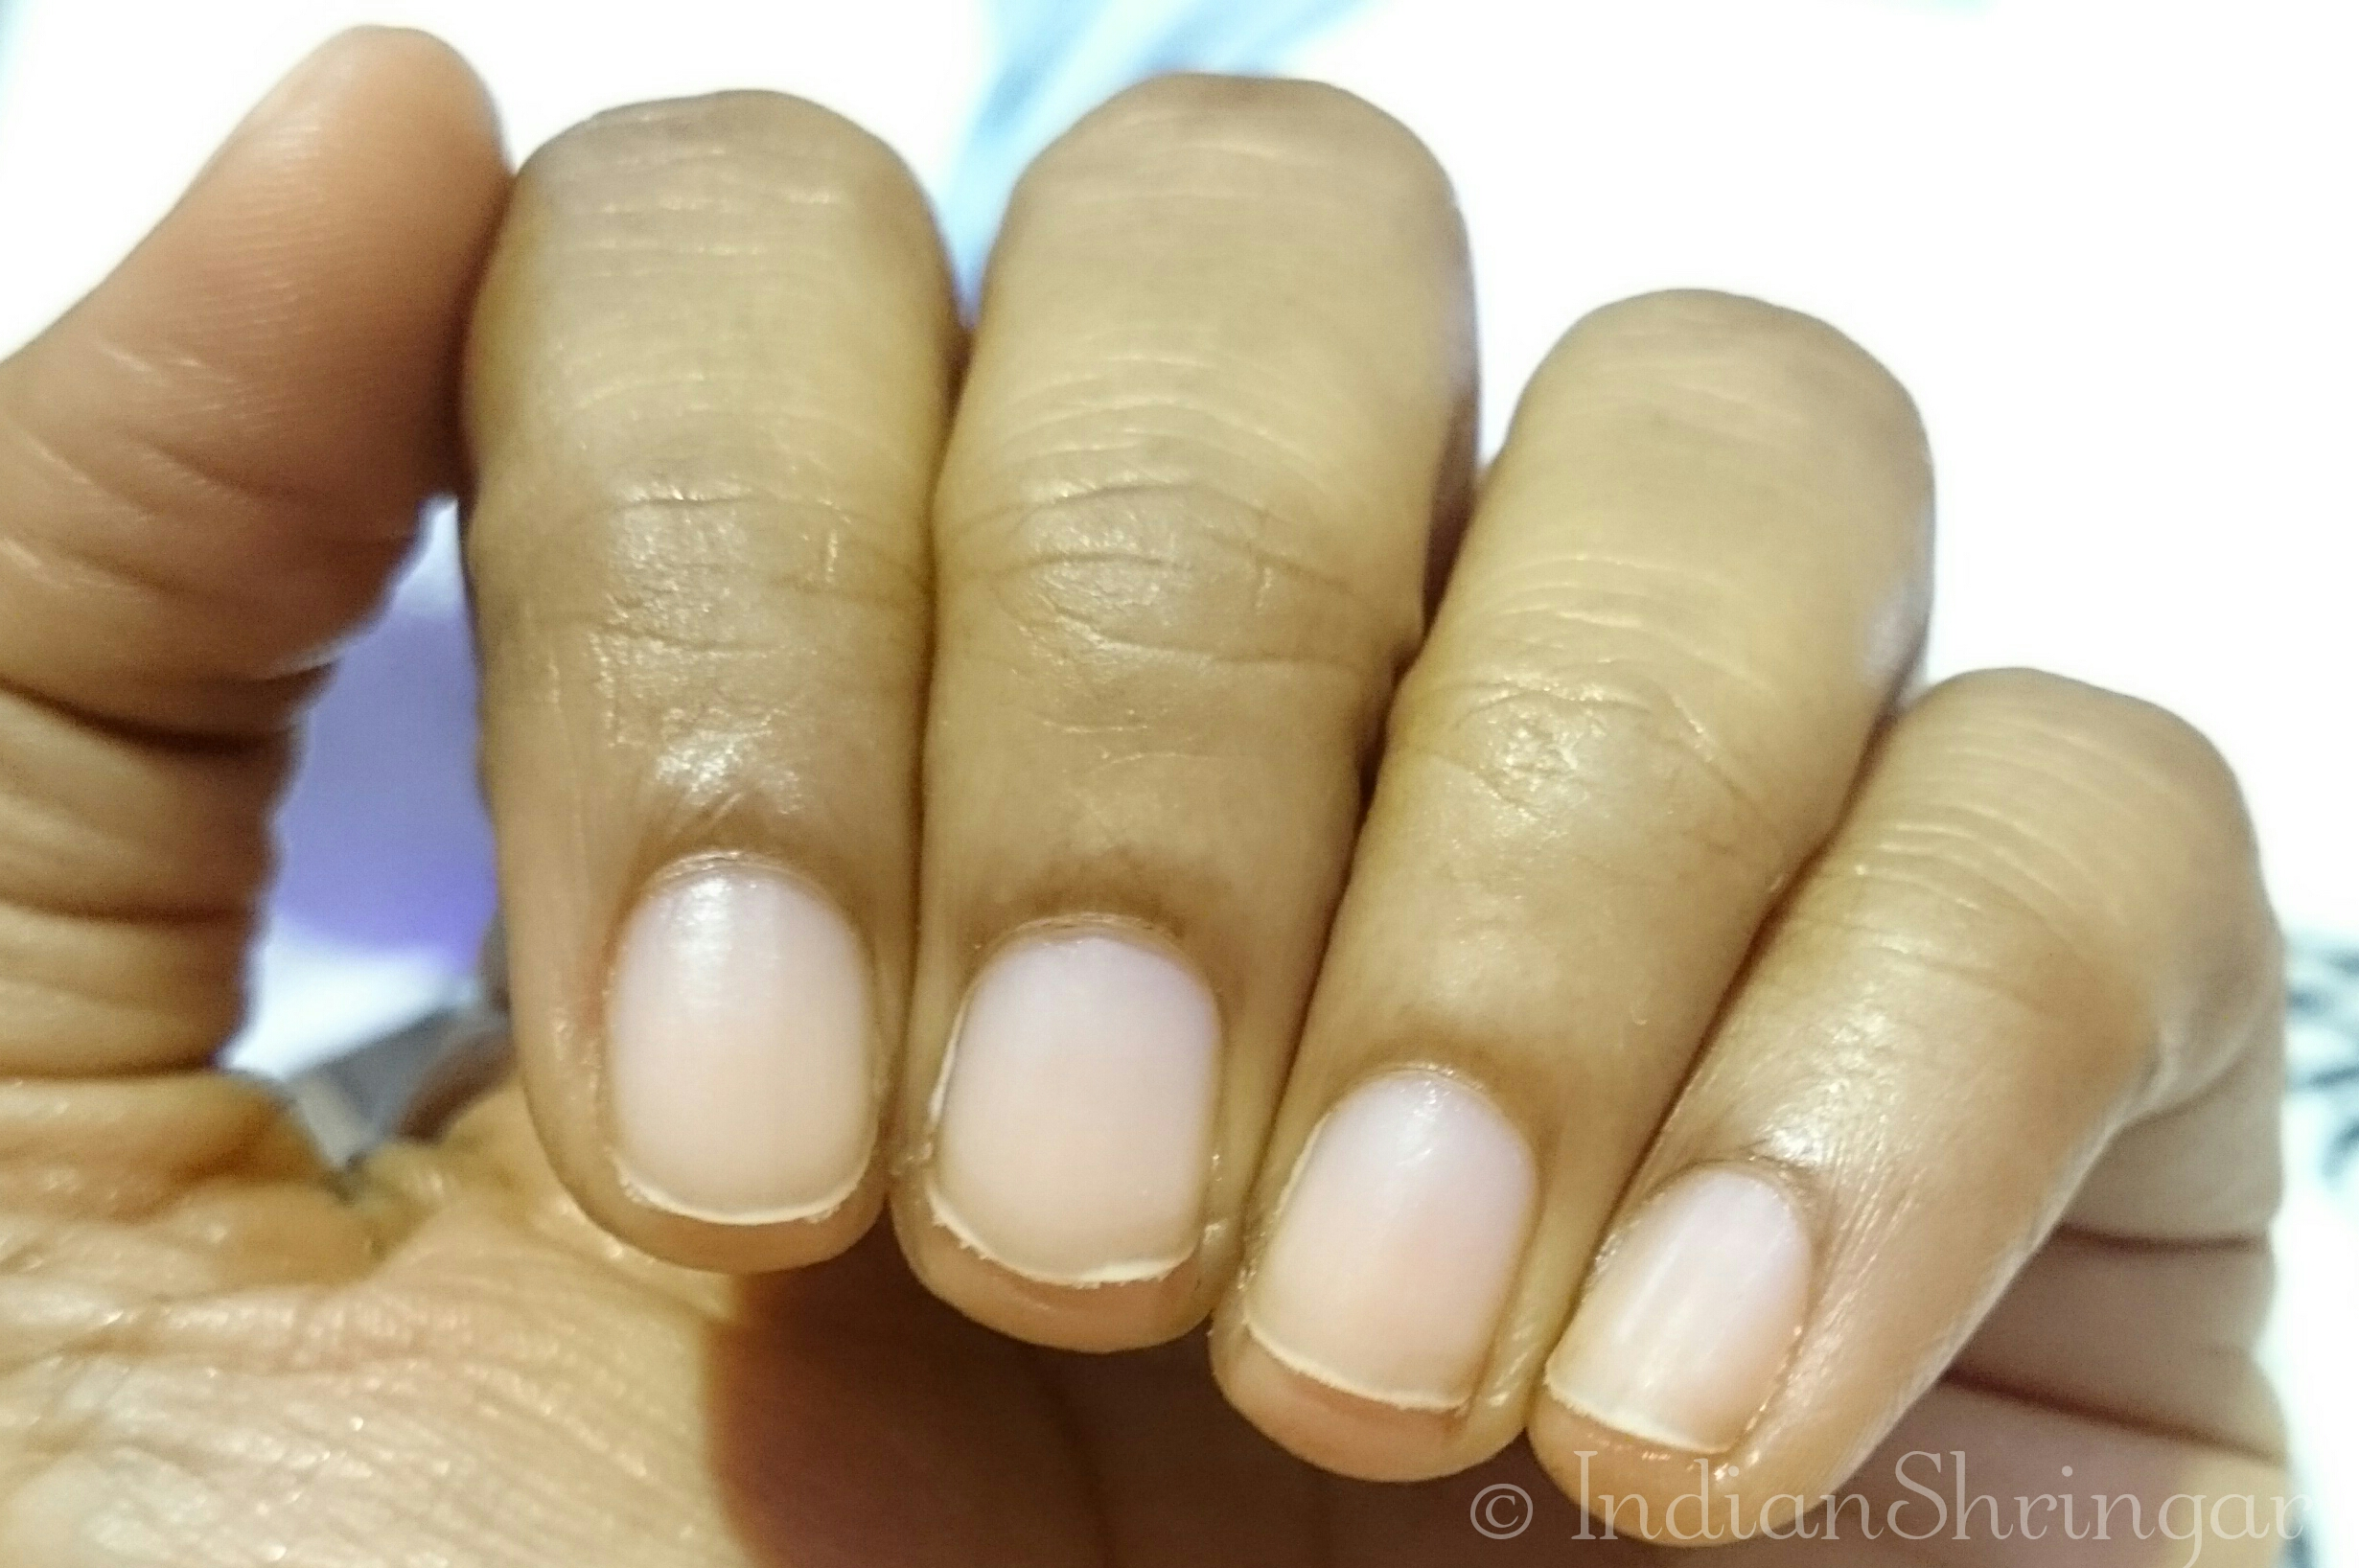 gel nails procedure photo - 2